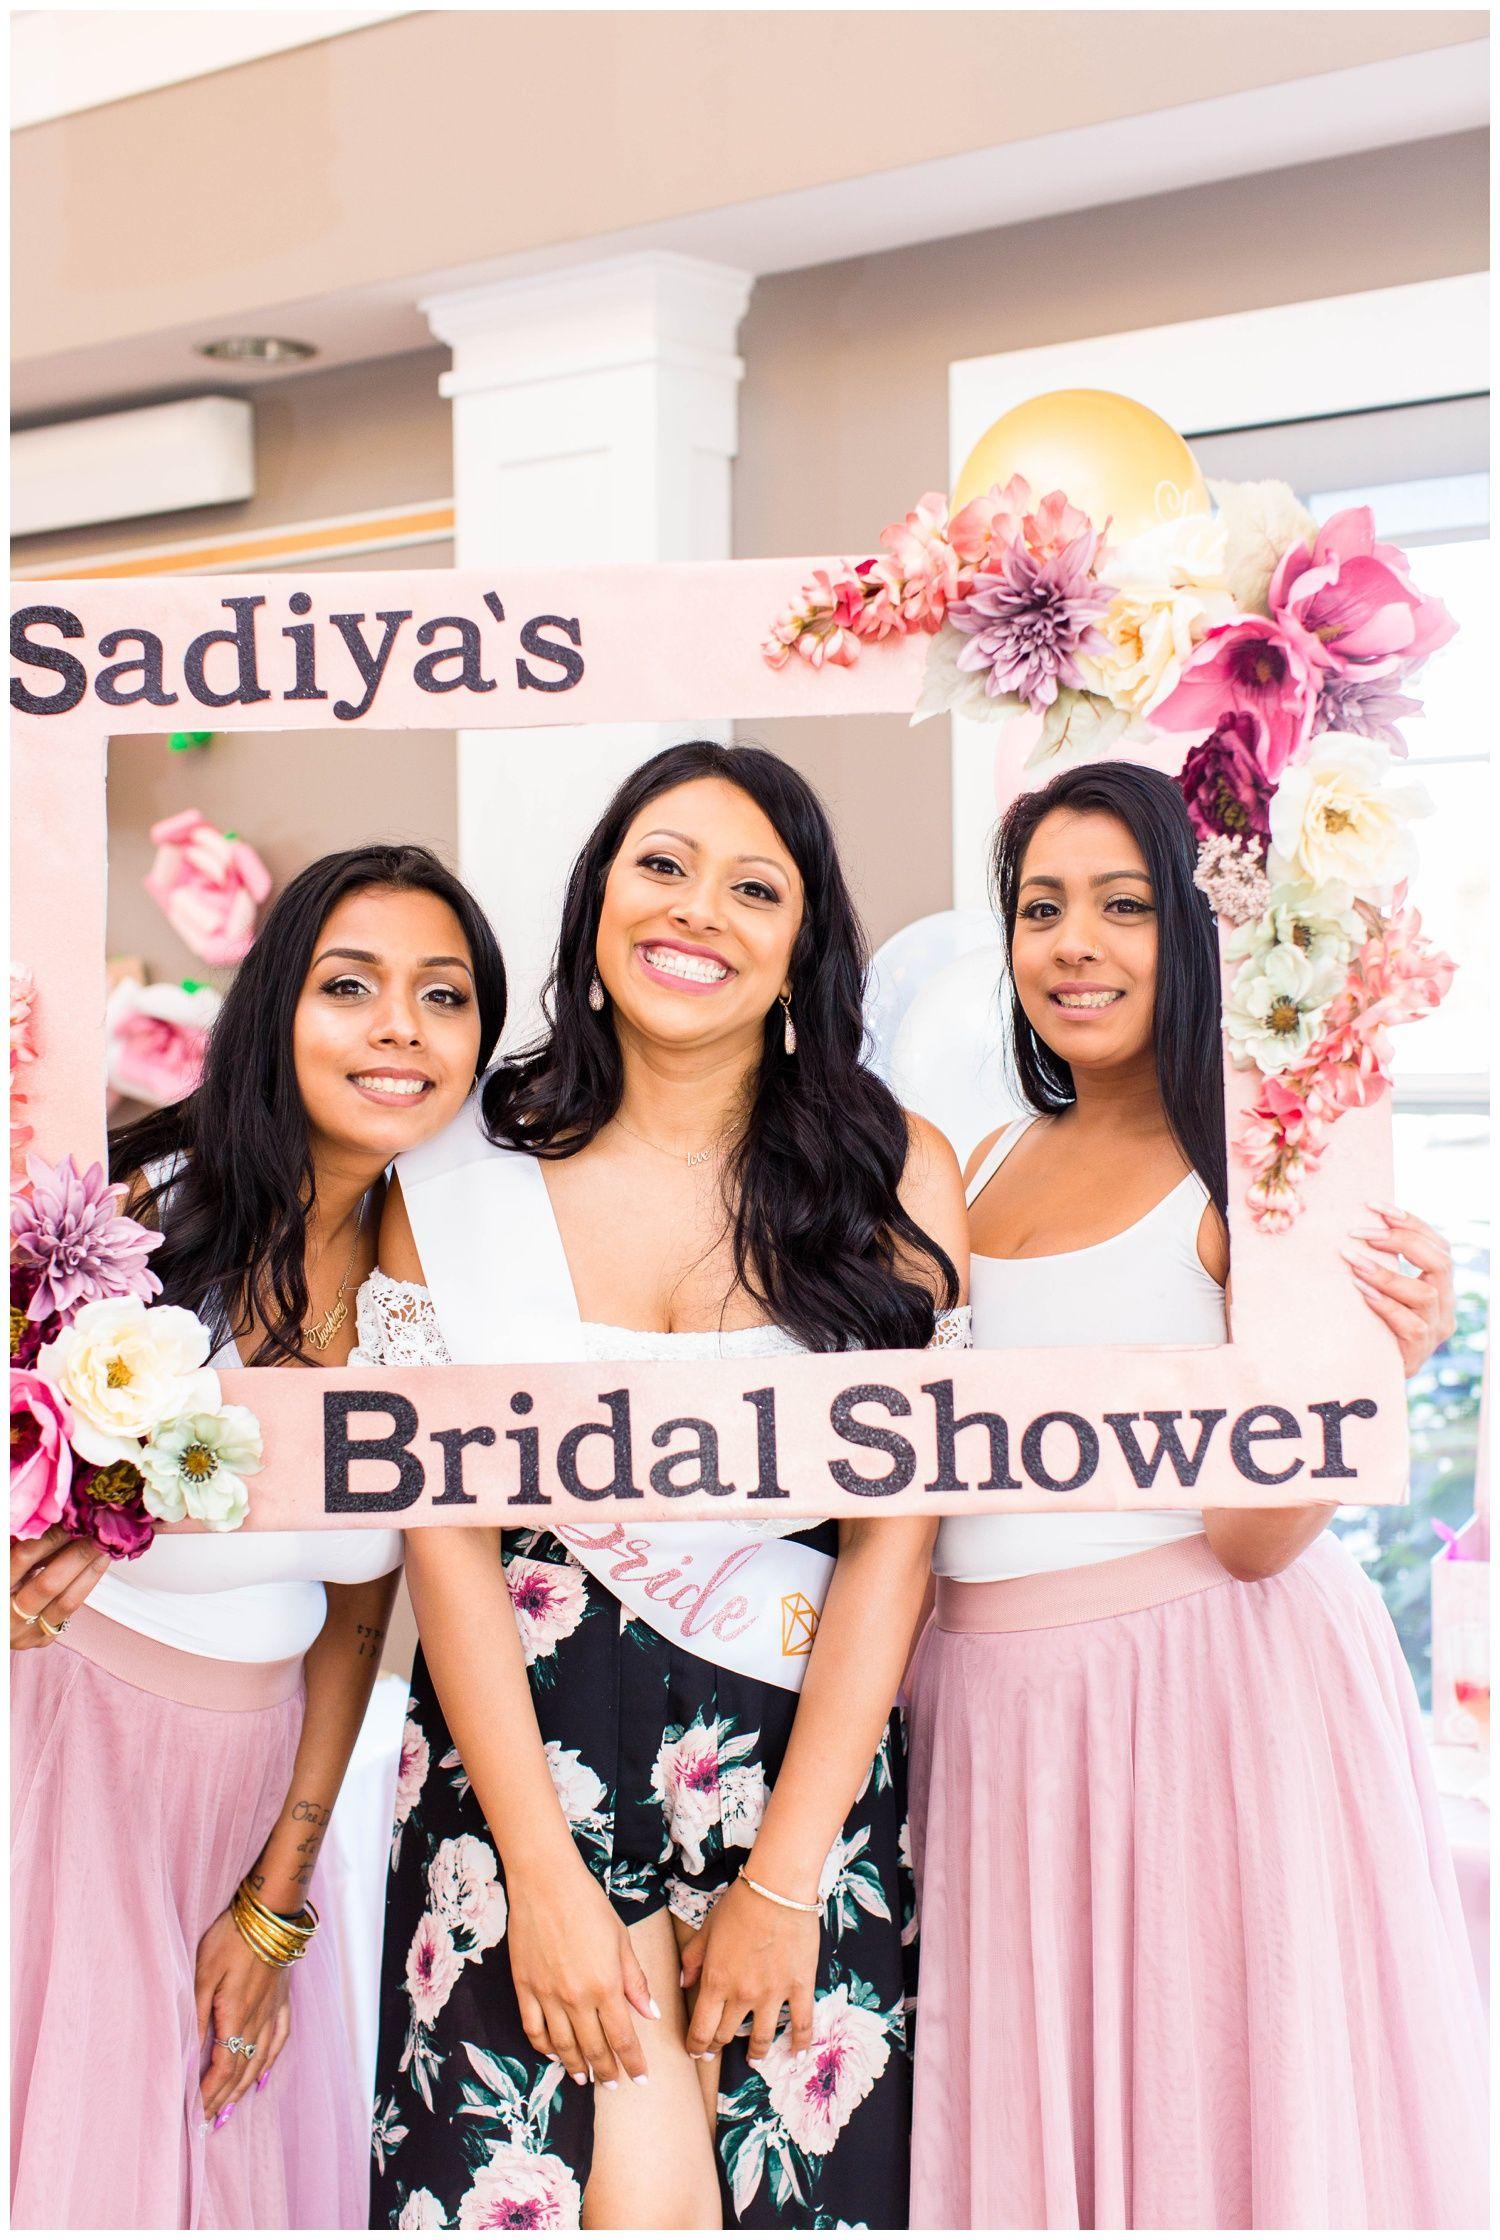 Sadiya S Blush And Floral Bridal Shower Indian Bridal Shower Bridal Shower Photography Bridal Shower Photos [ 2240 x 1500 Pixel ]